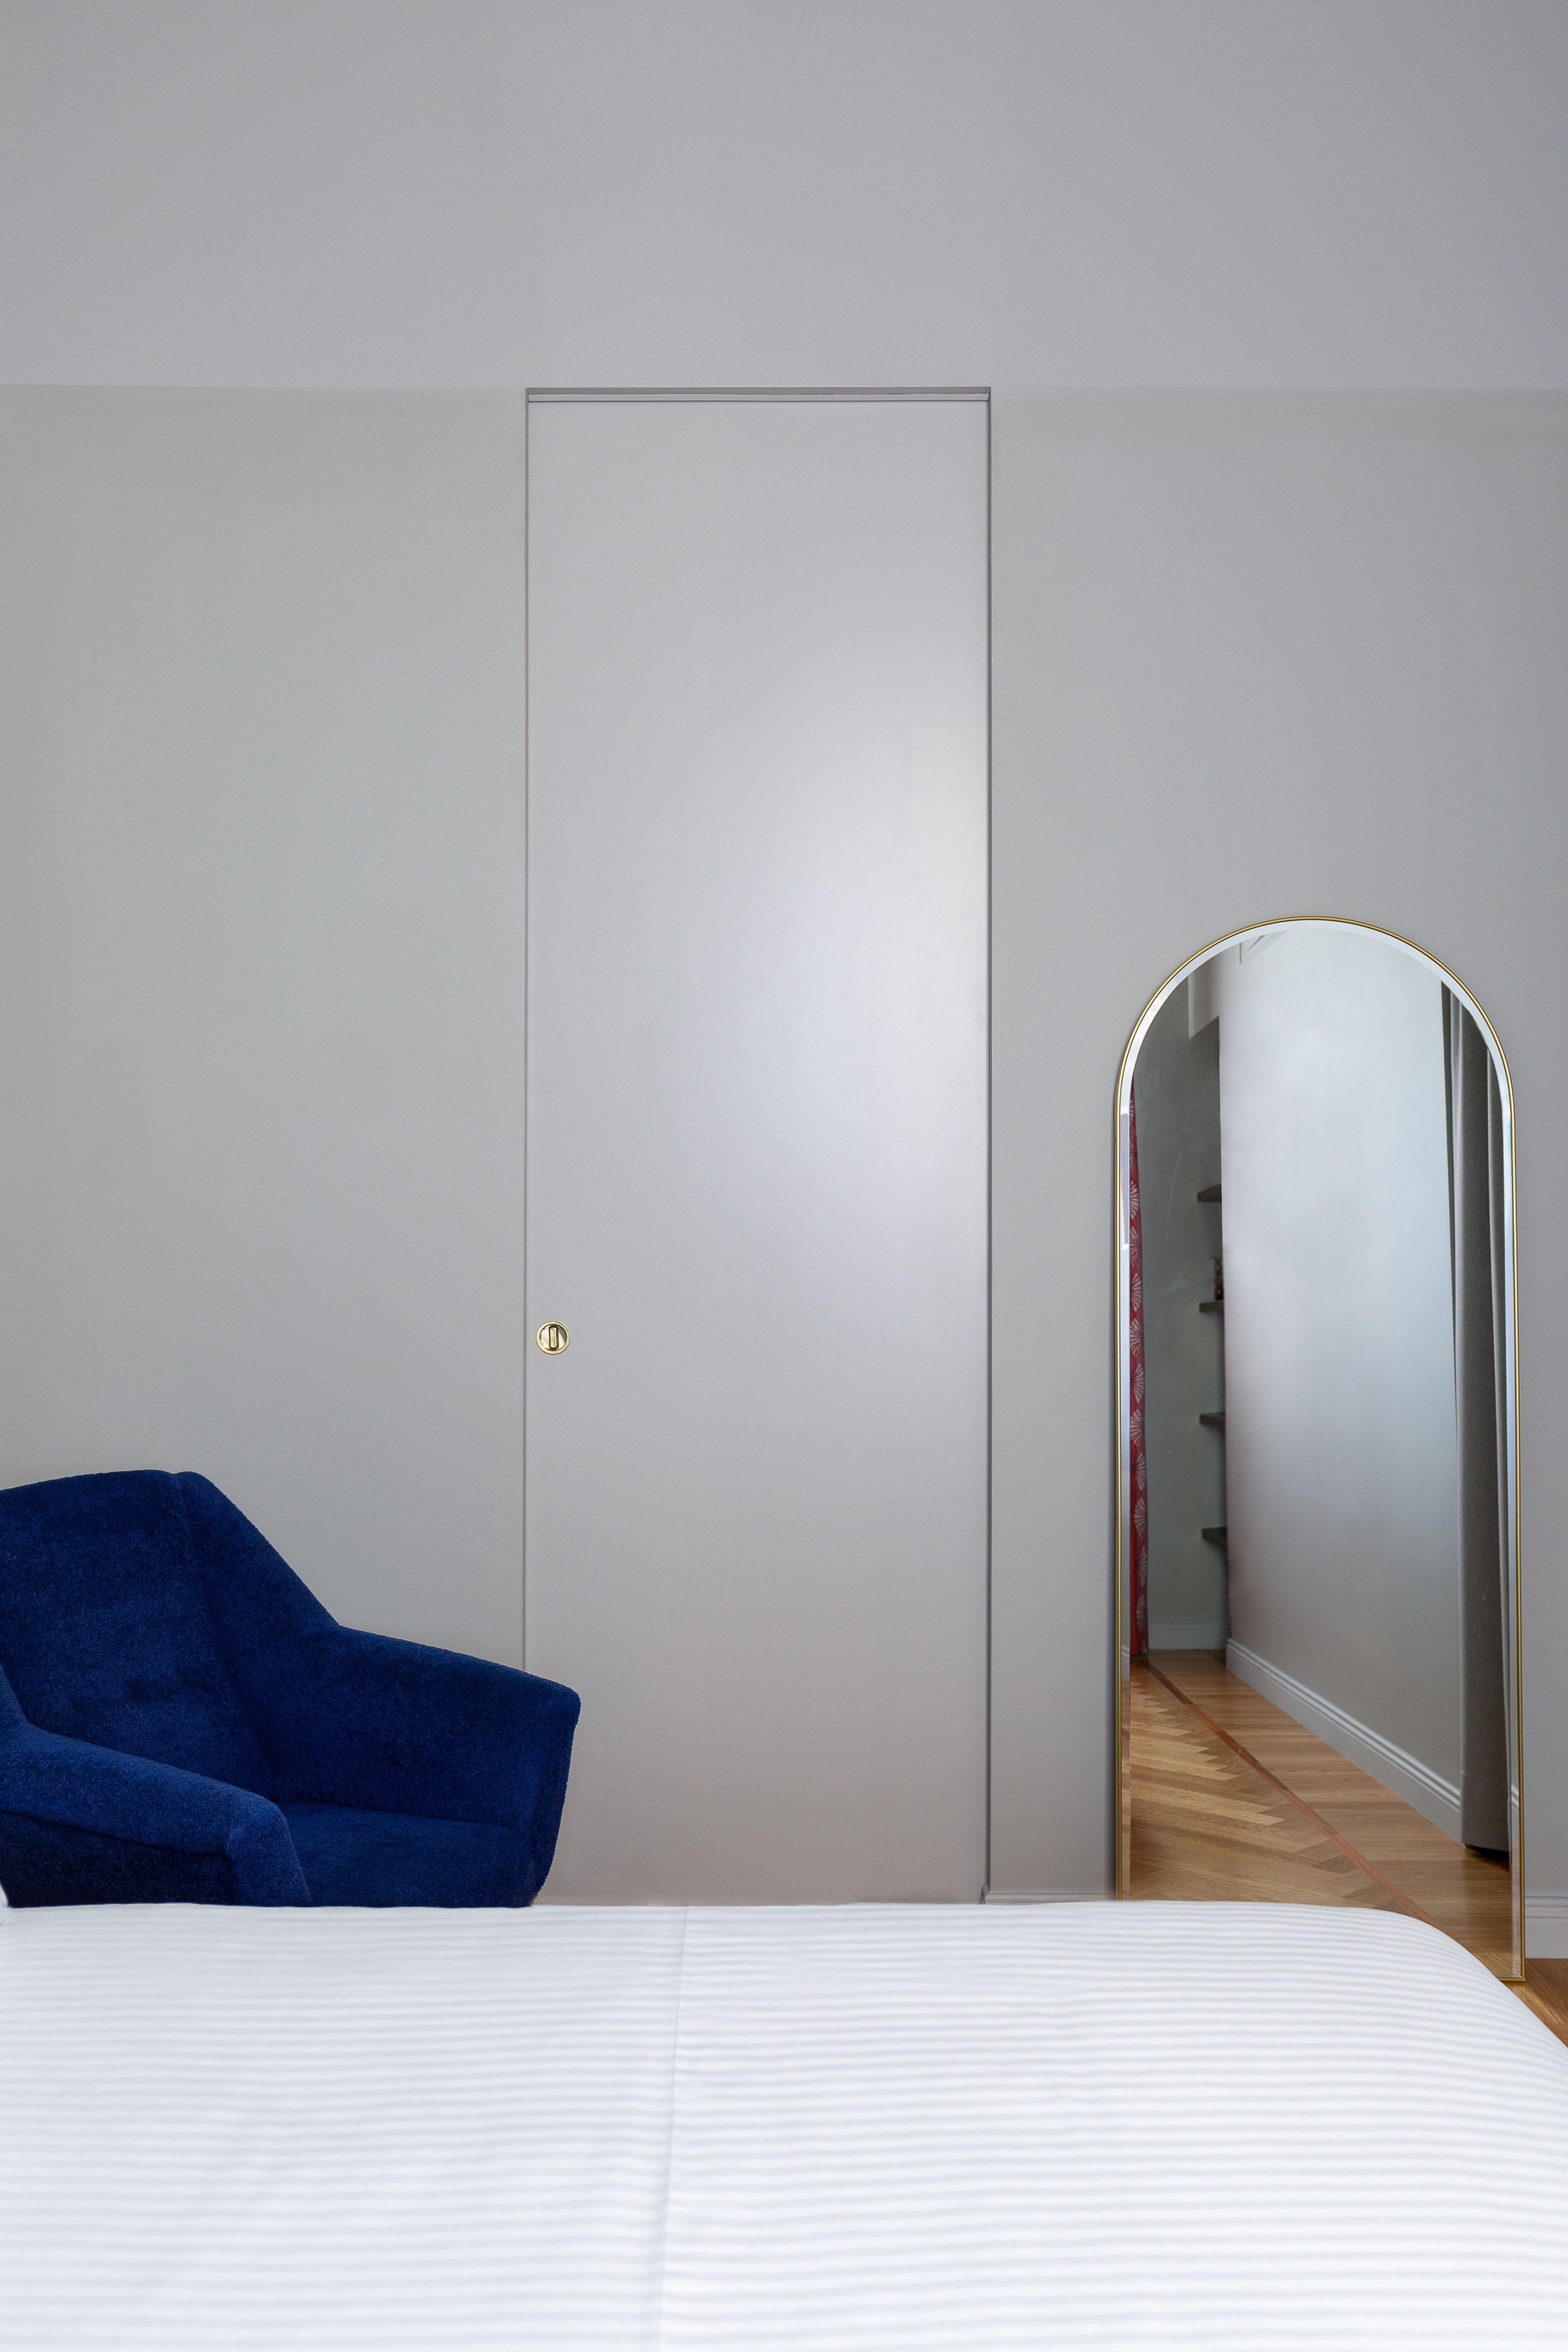 kickoffice broggi apartments bedroom grey surface blue